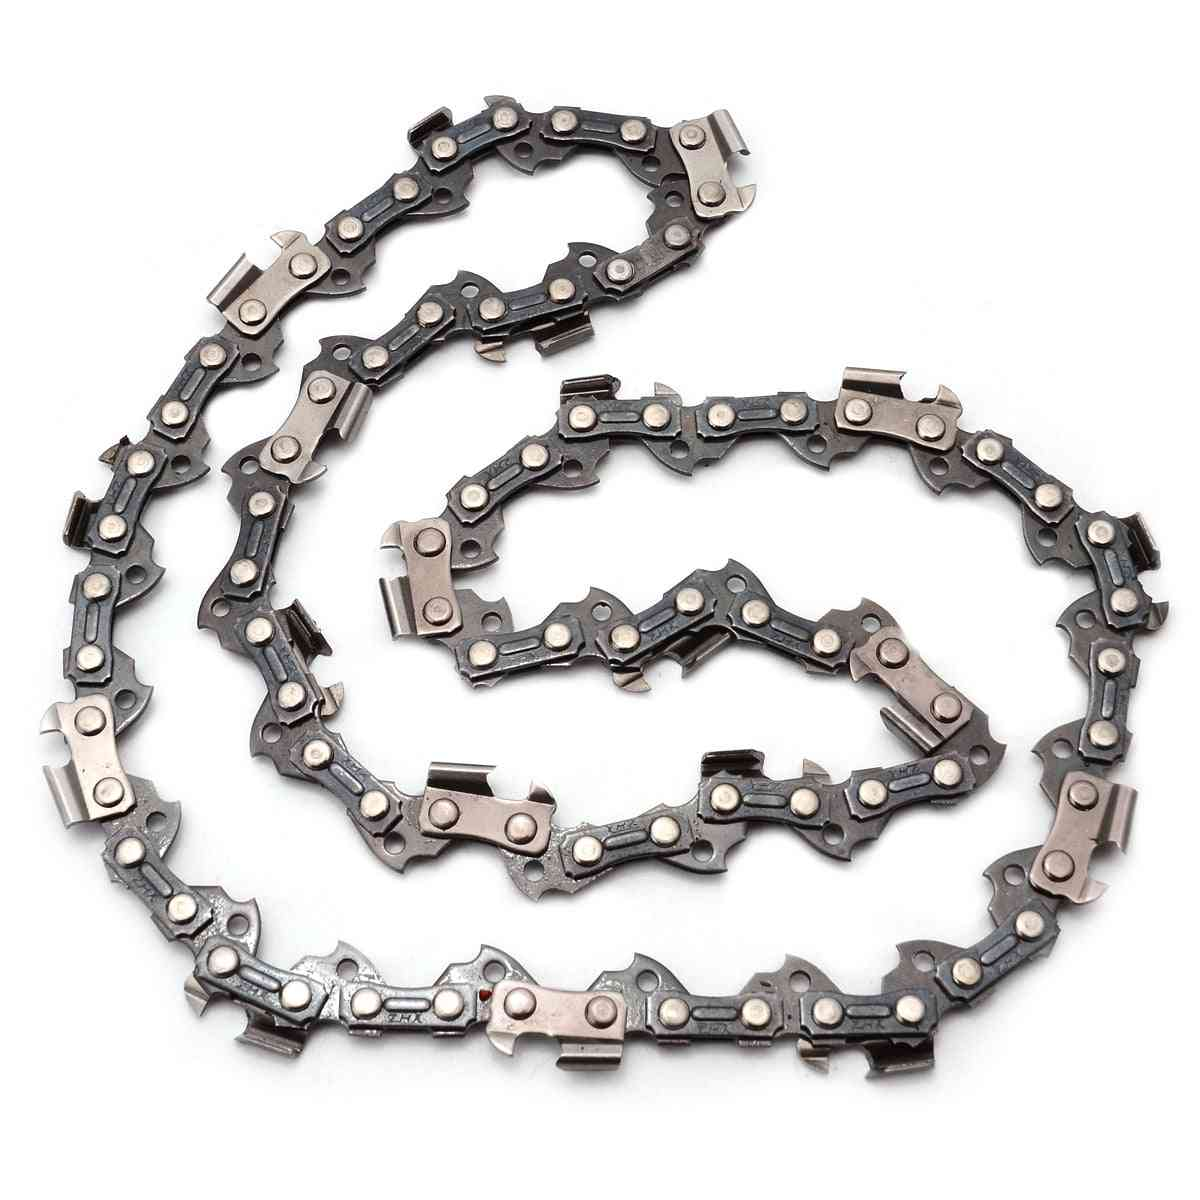 10 Inch Semi Chisel-cutting Chain For Lawn Mower, Garden Tool